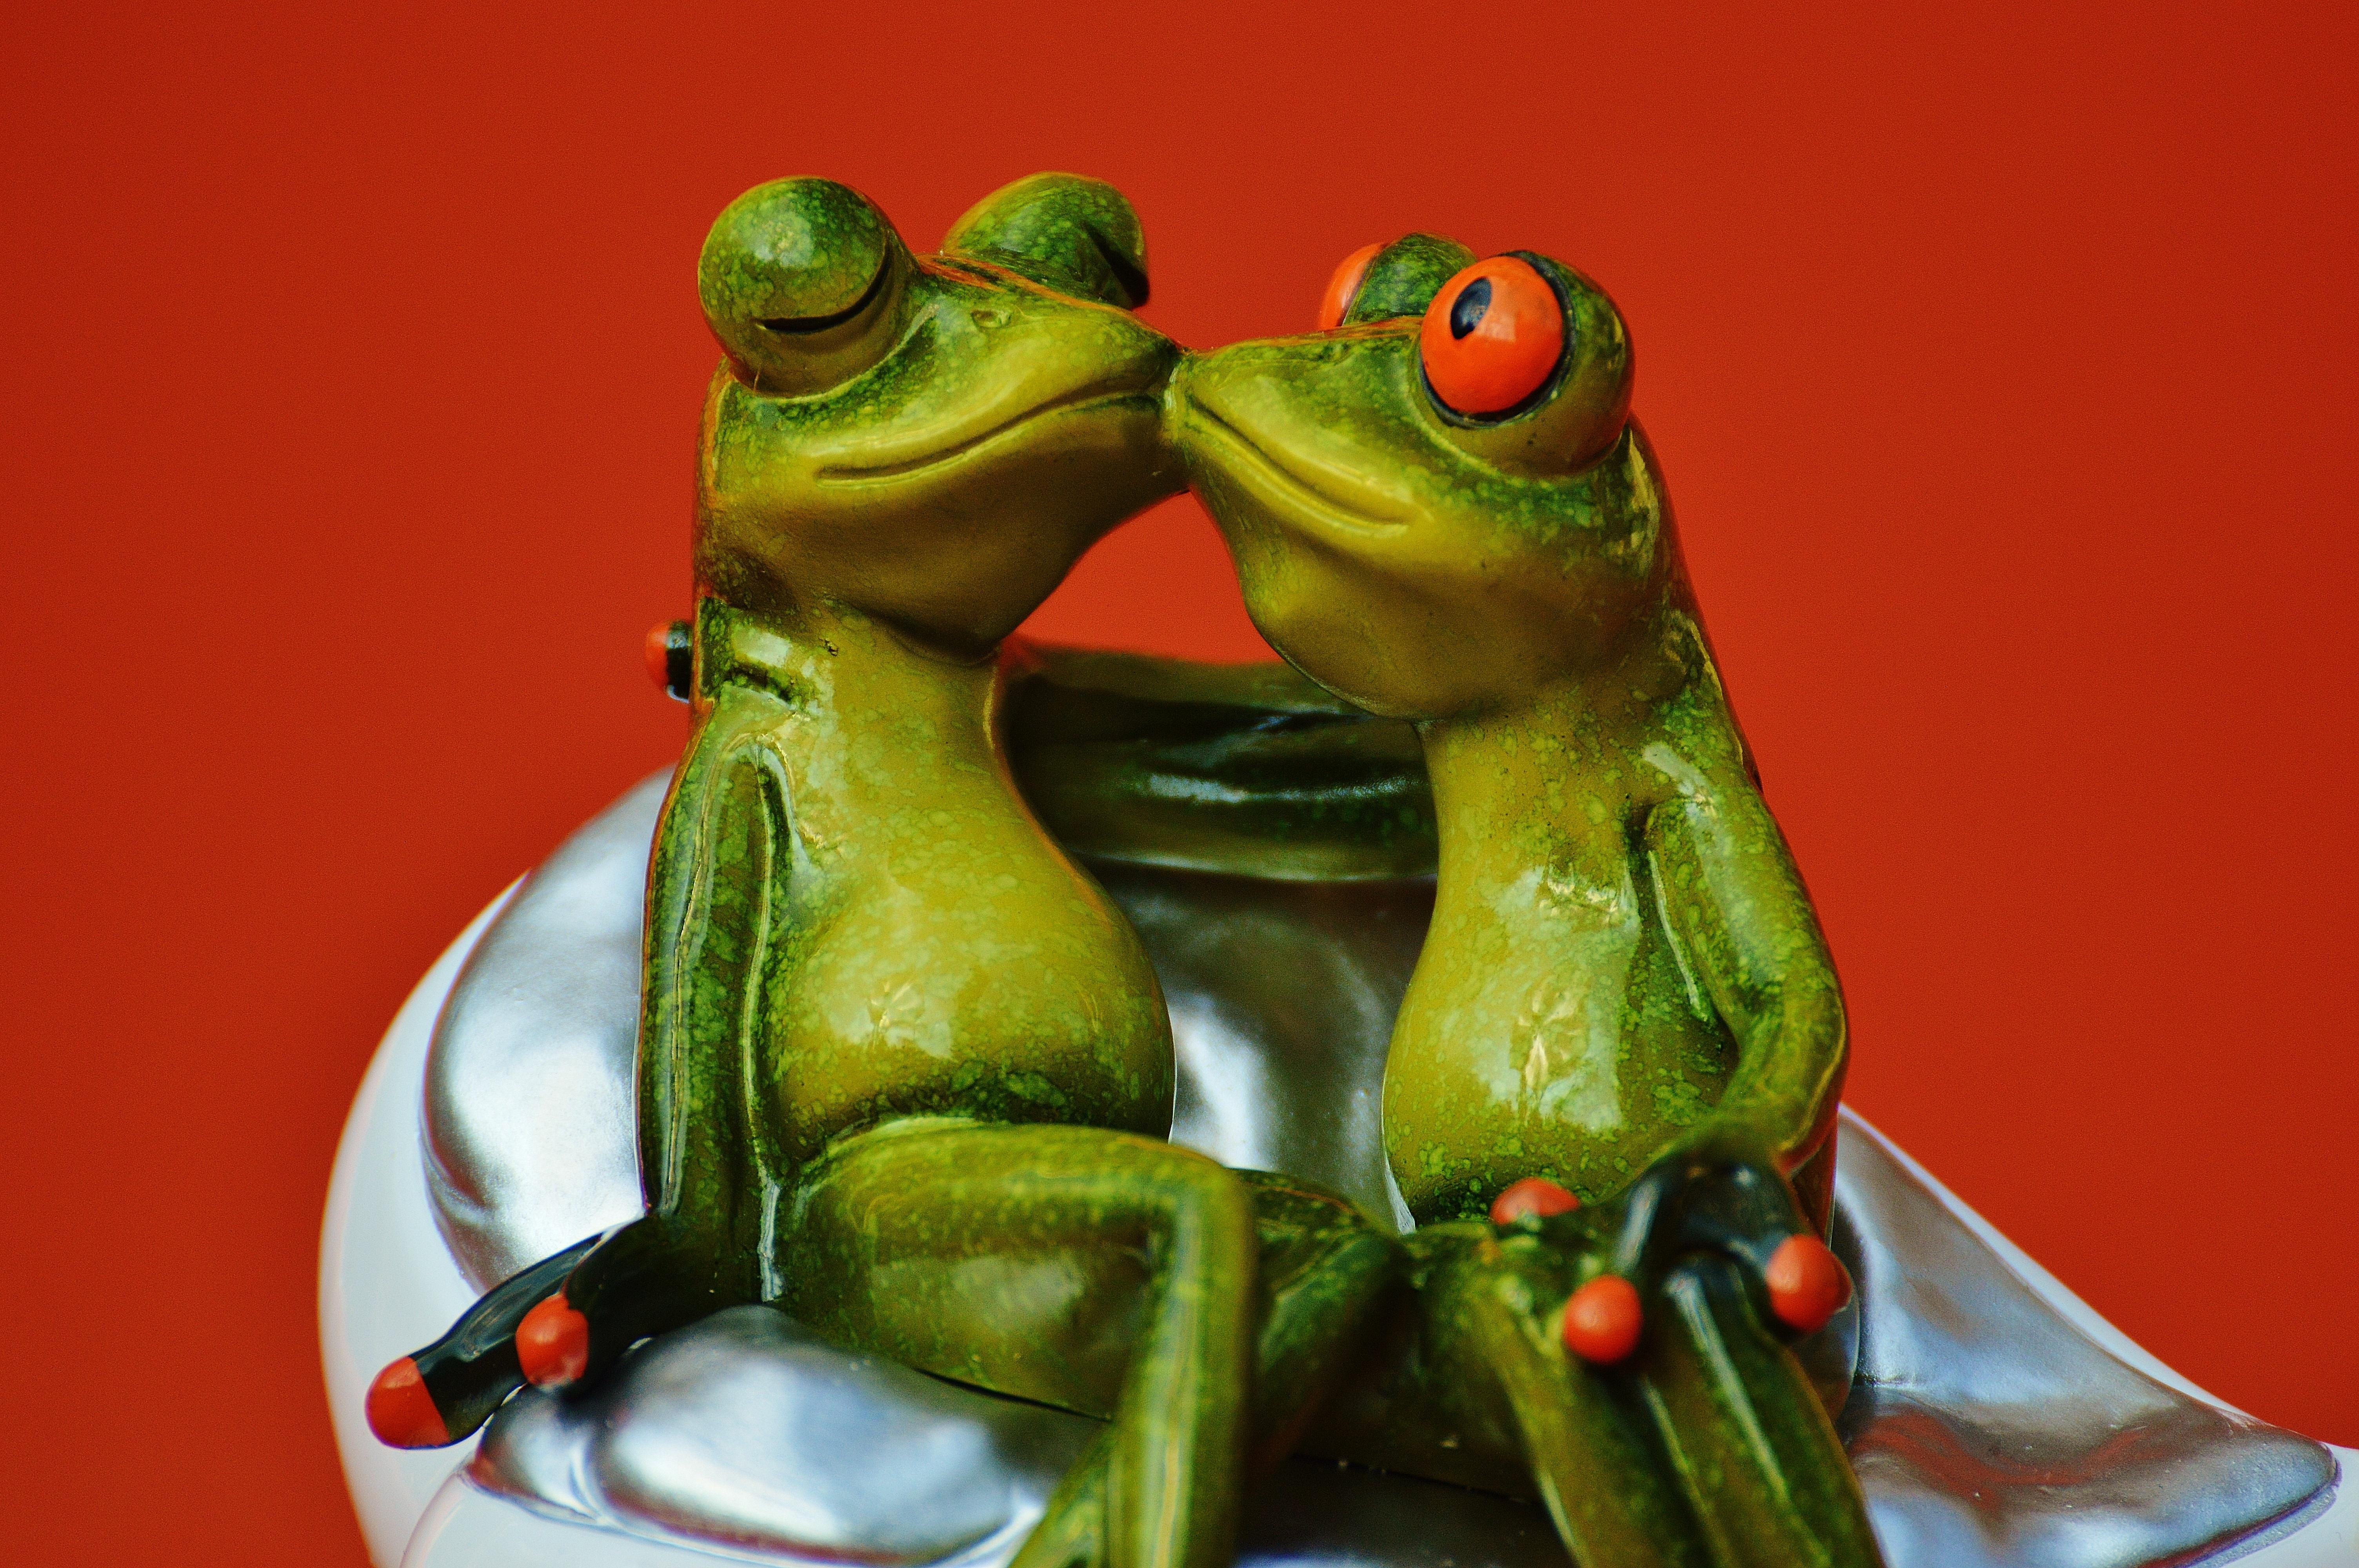 картинки поцеловала жабу поле, какими-то маленькими